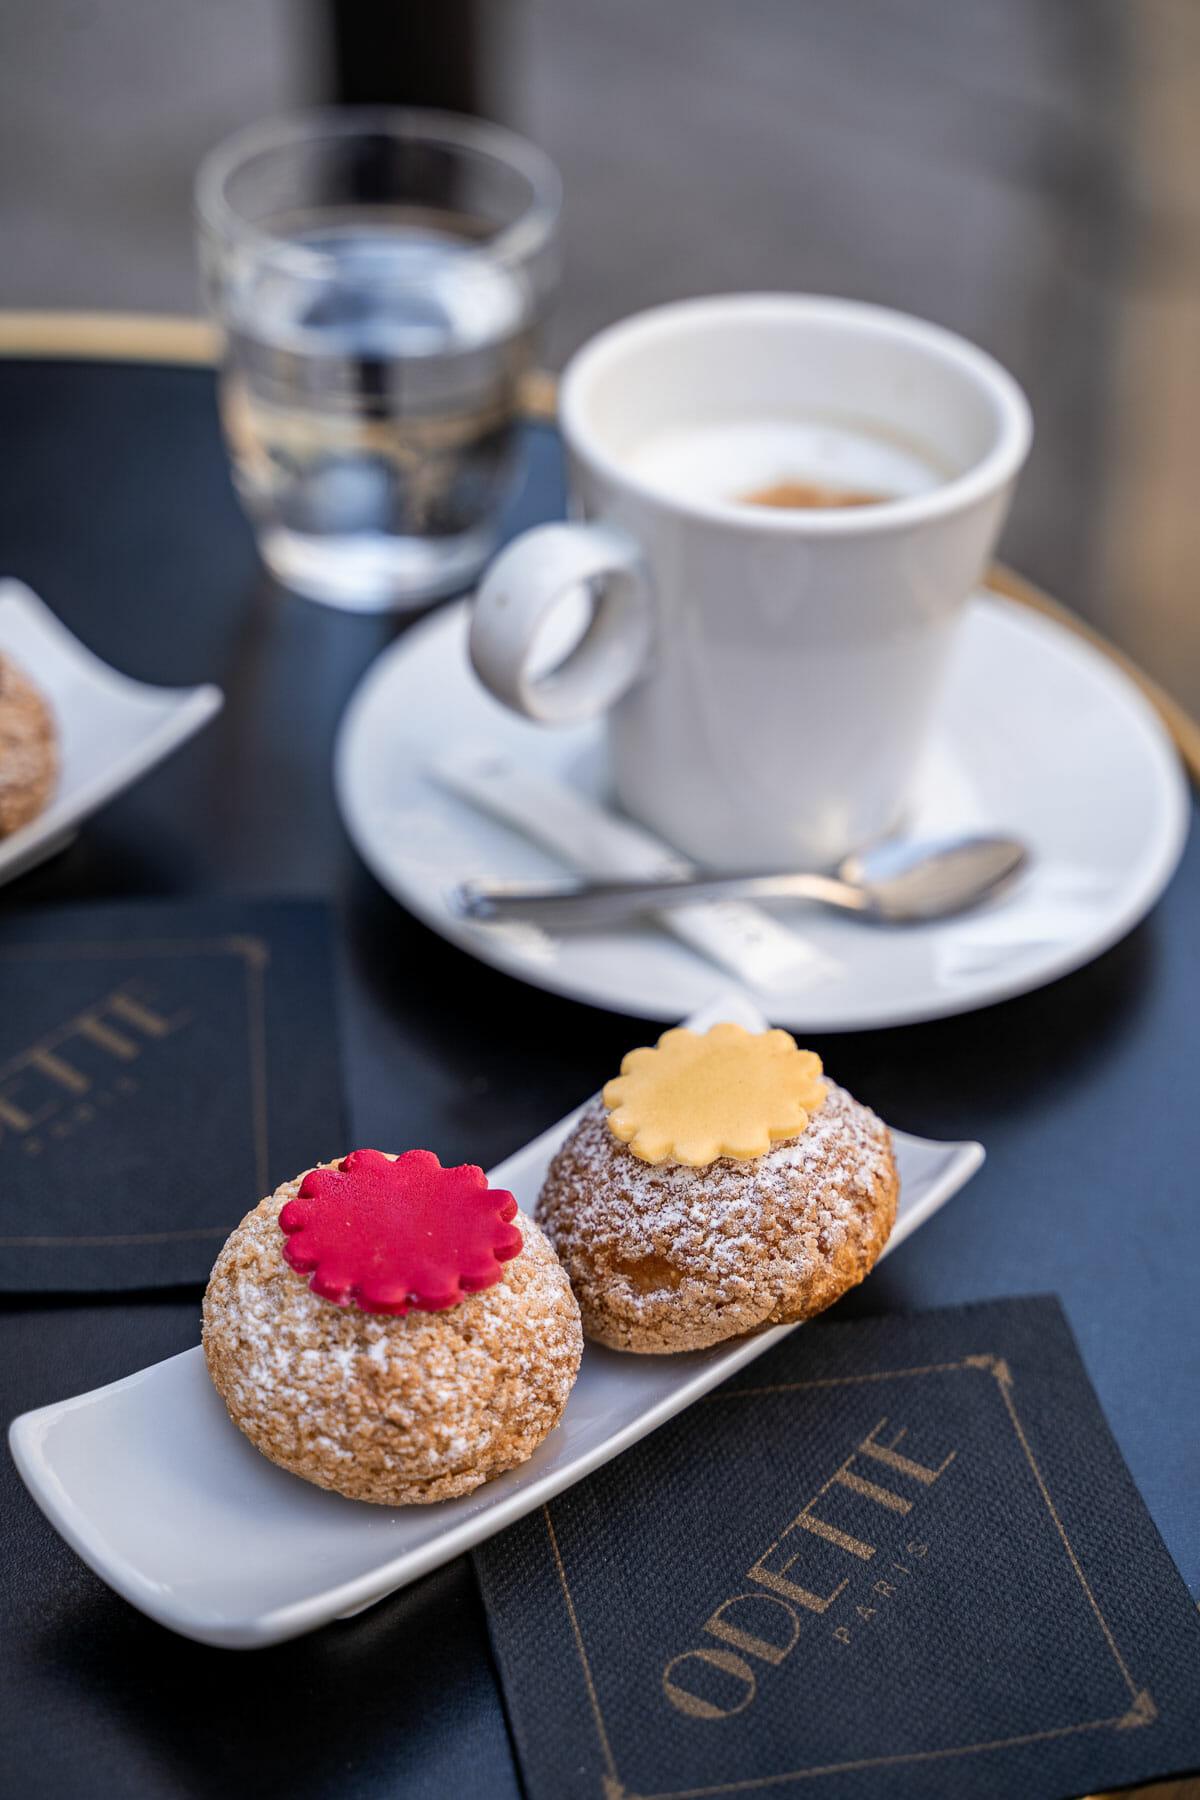 Creme puffs at Odette Paris